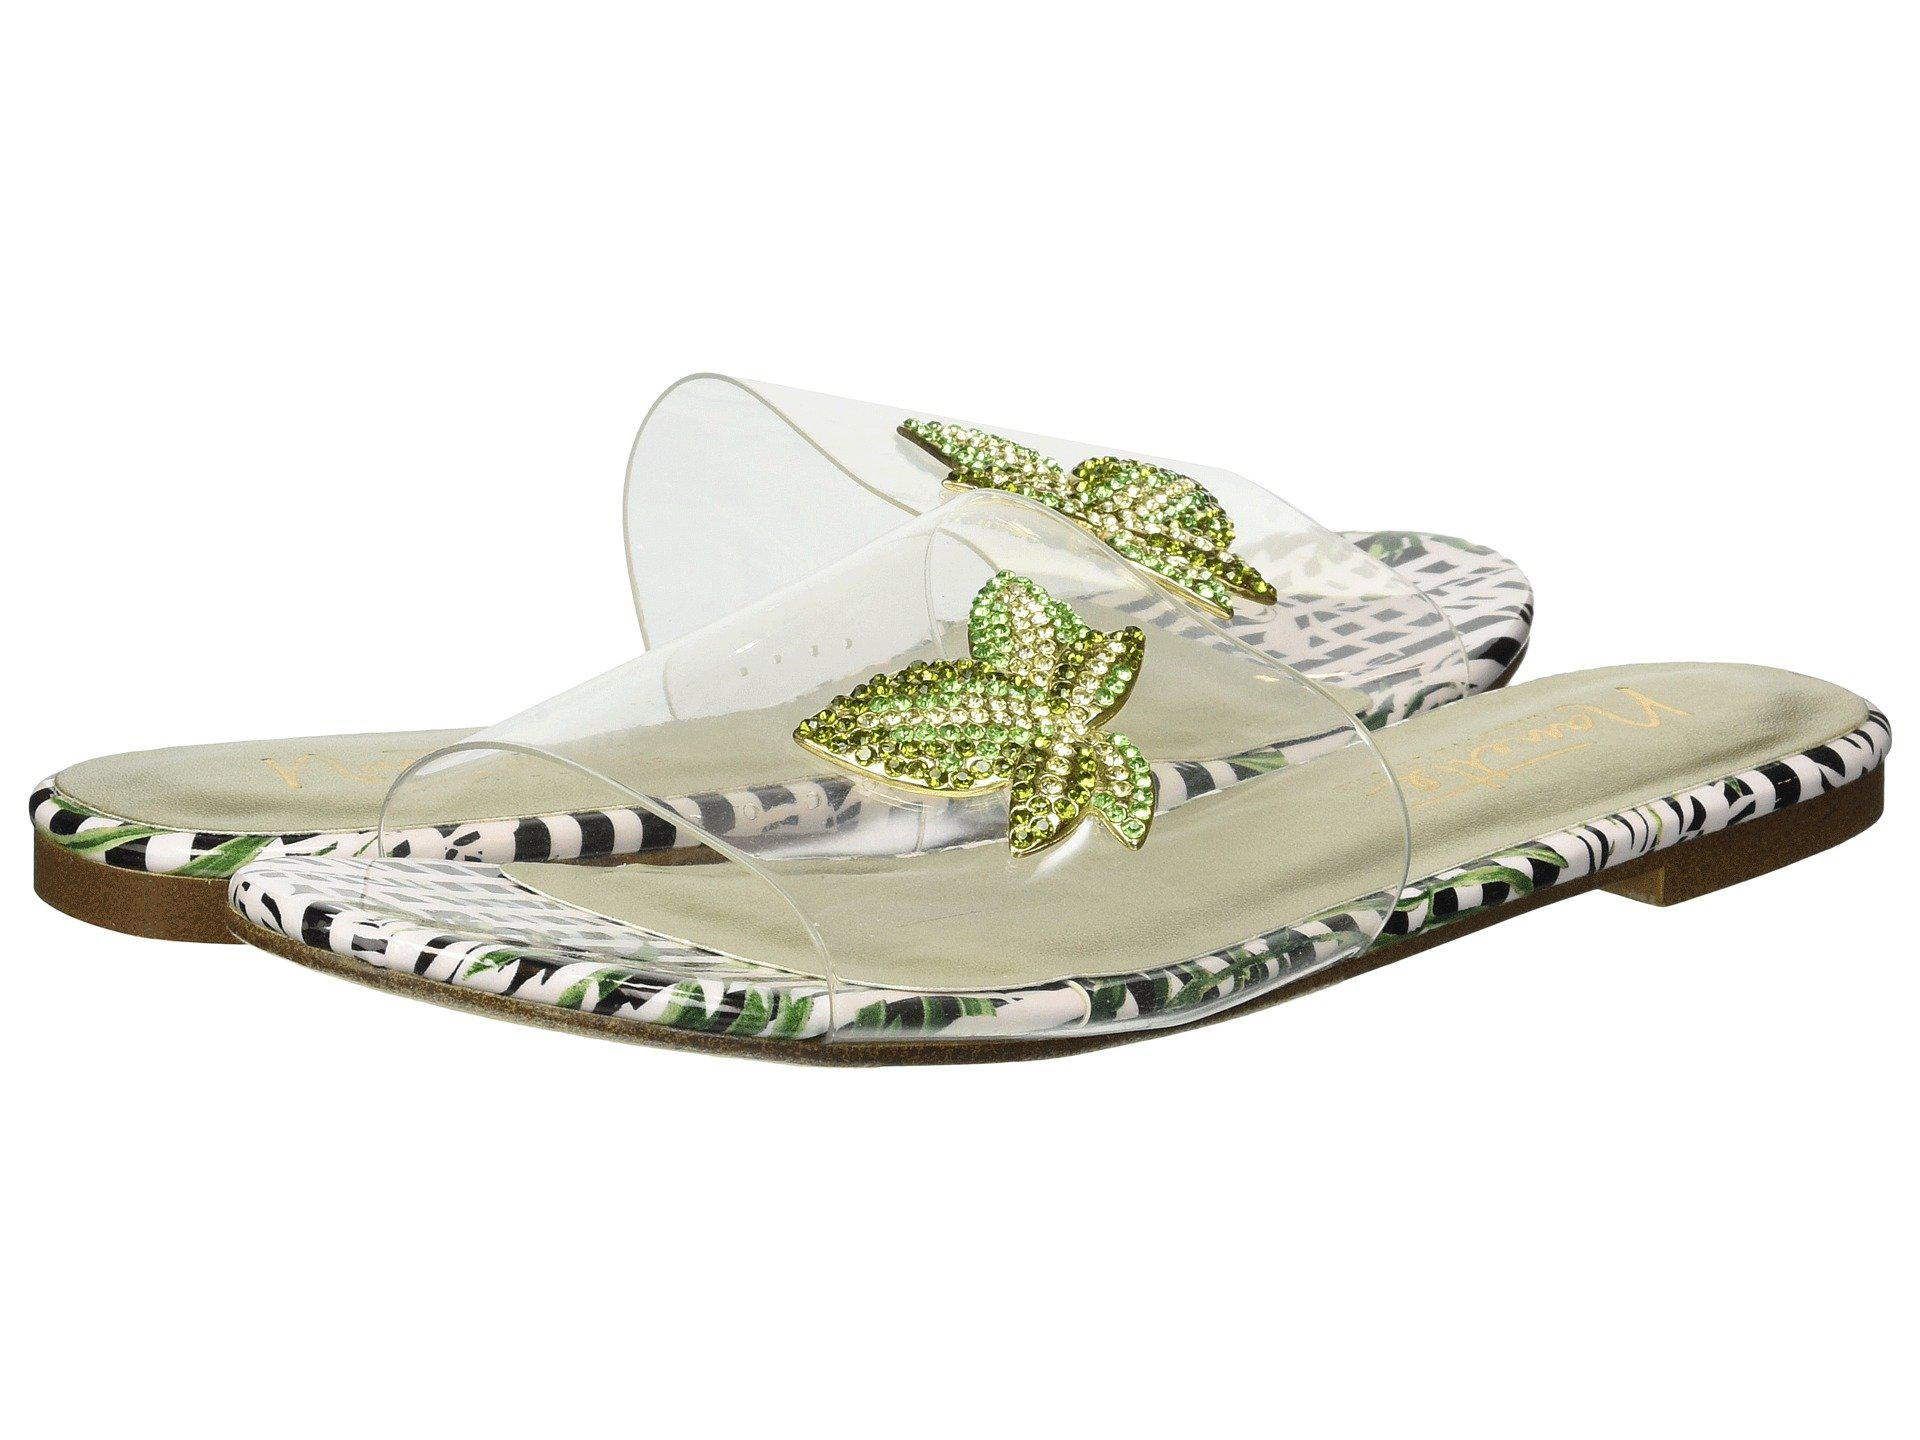 Nanette Lepore Nanette by Veronica Slide Sandals Women's Shoes 8AUFO